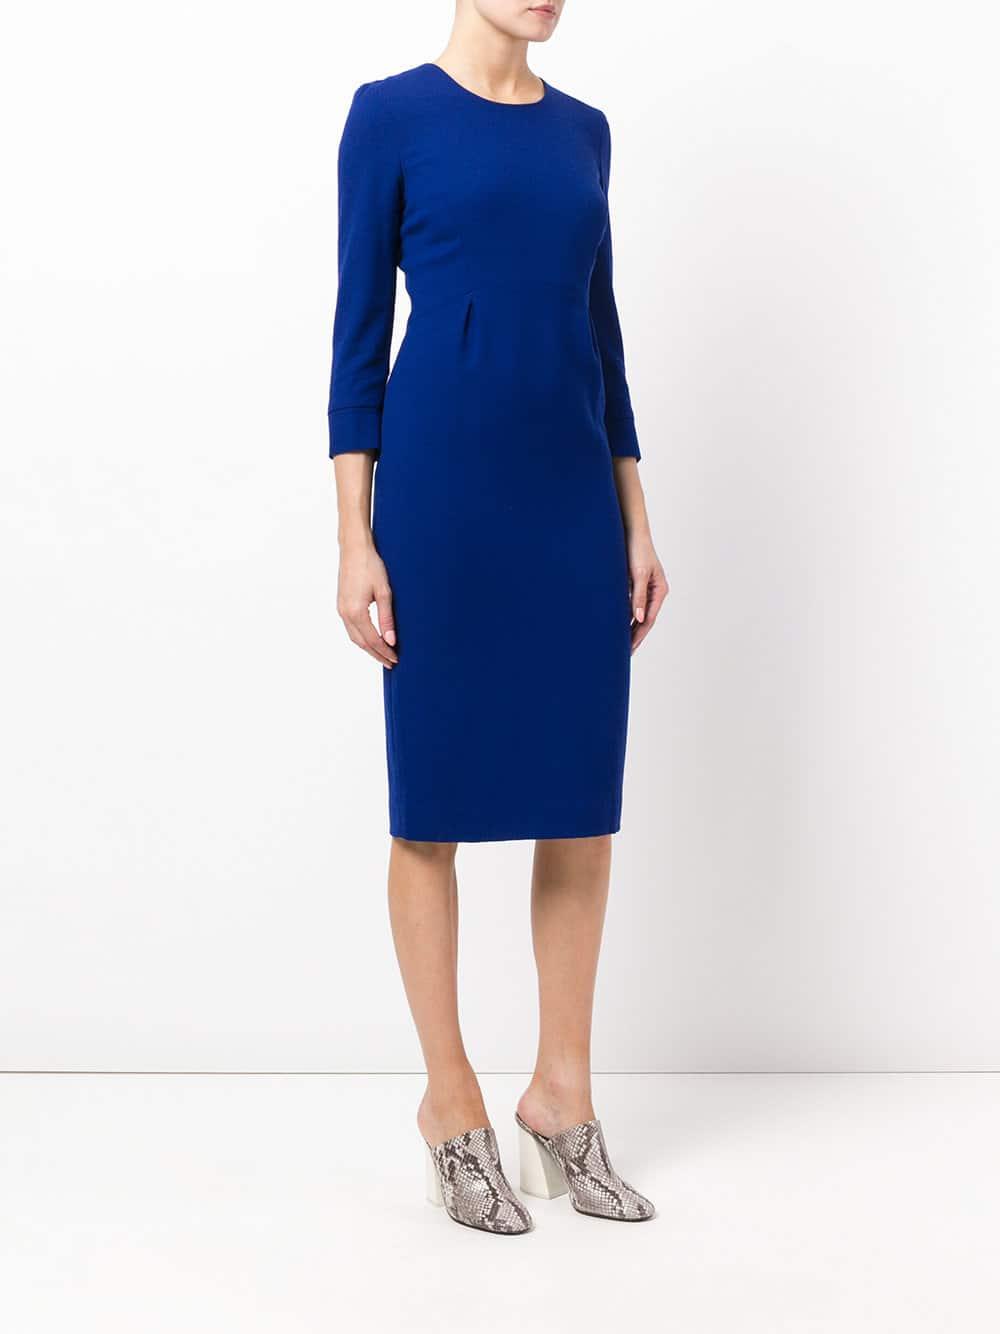 GOAT Electra Blue Dress